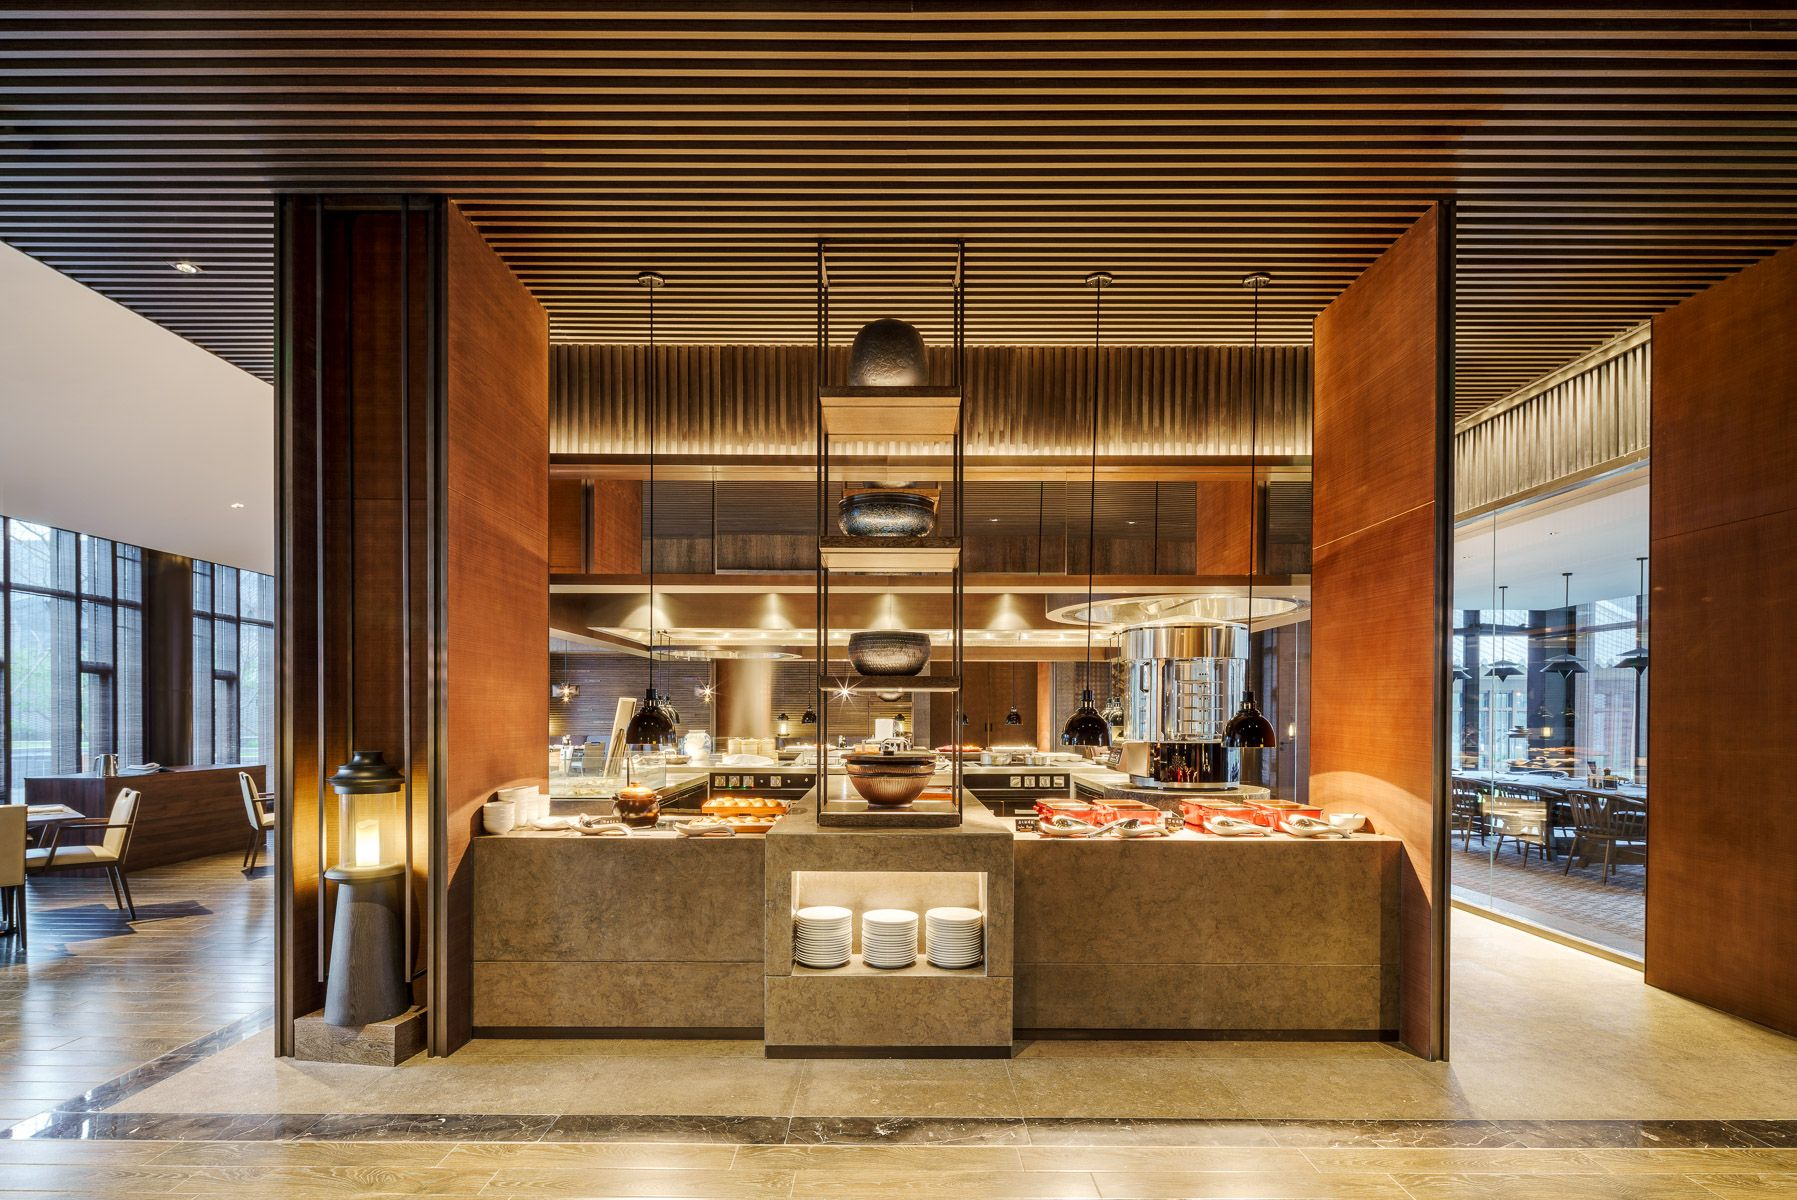 Buffet Area at JW Marriott Qufu Luxury hotels interior